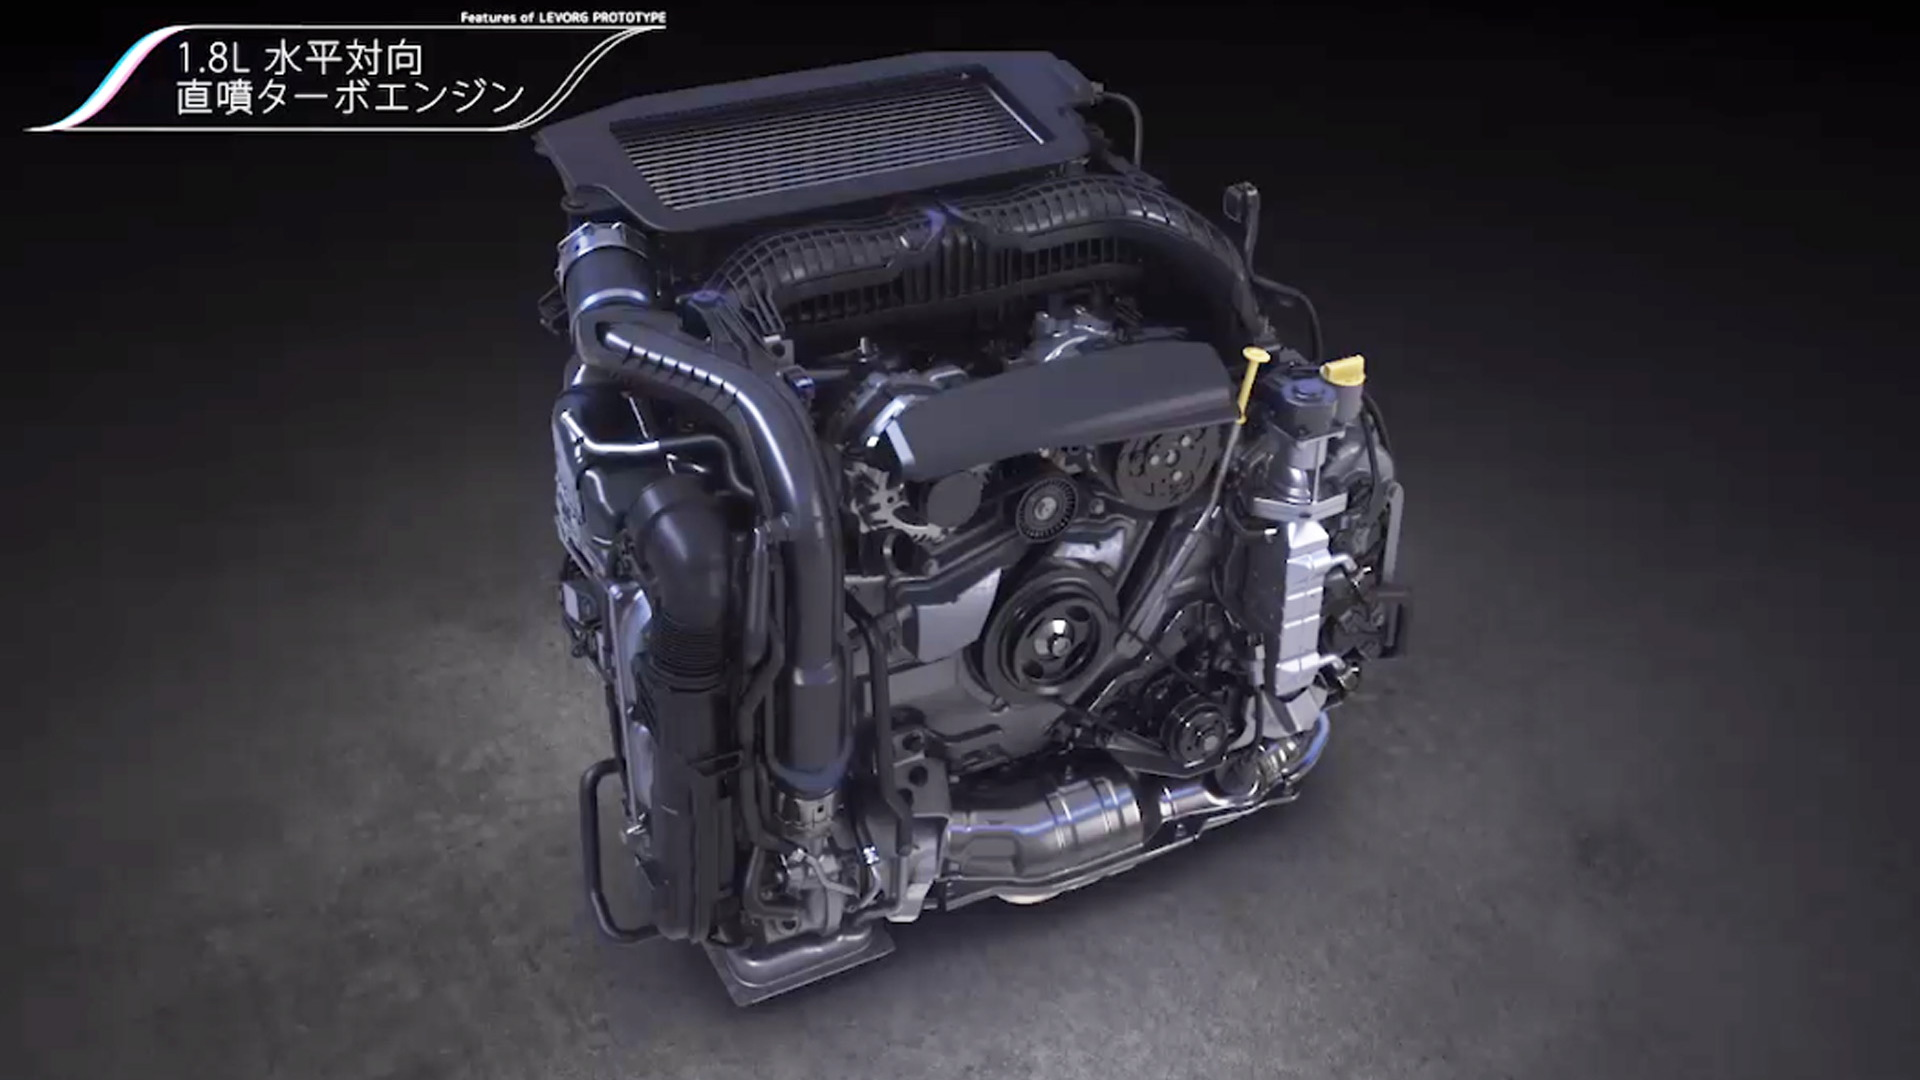 Subaru 1.8-liter turbocharged flat-4